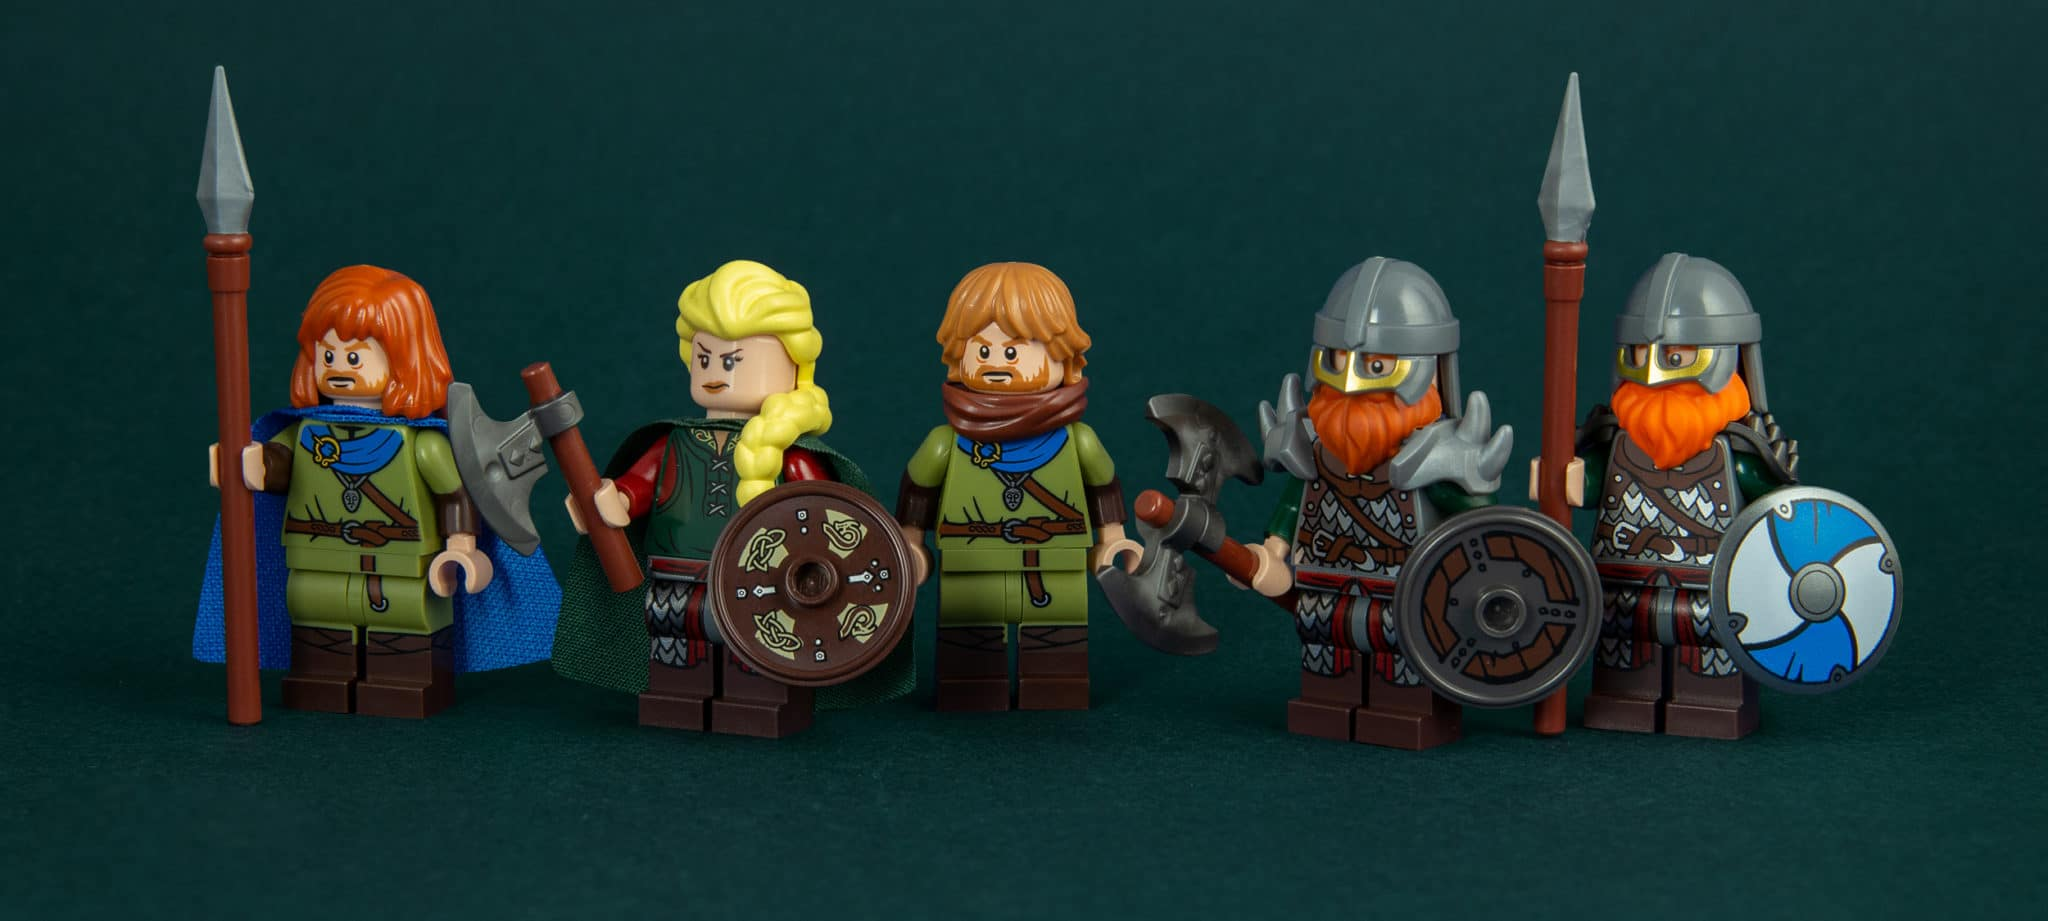 Viking Minifigures Crew 2500